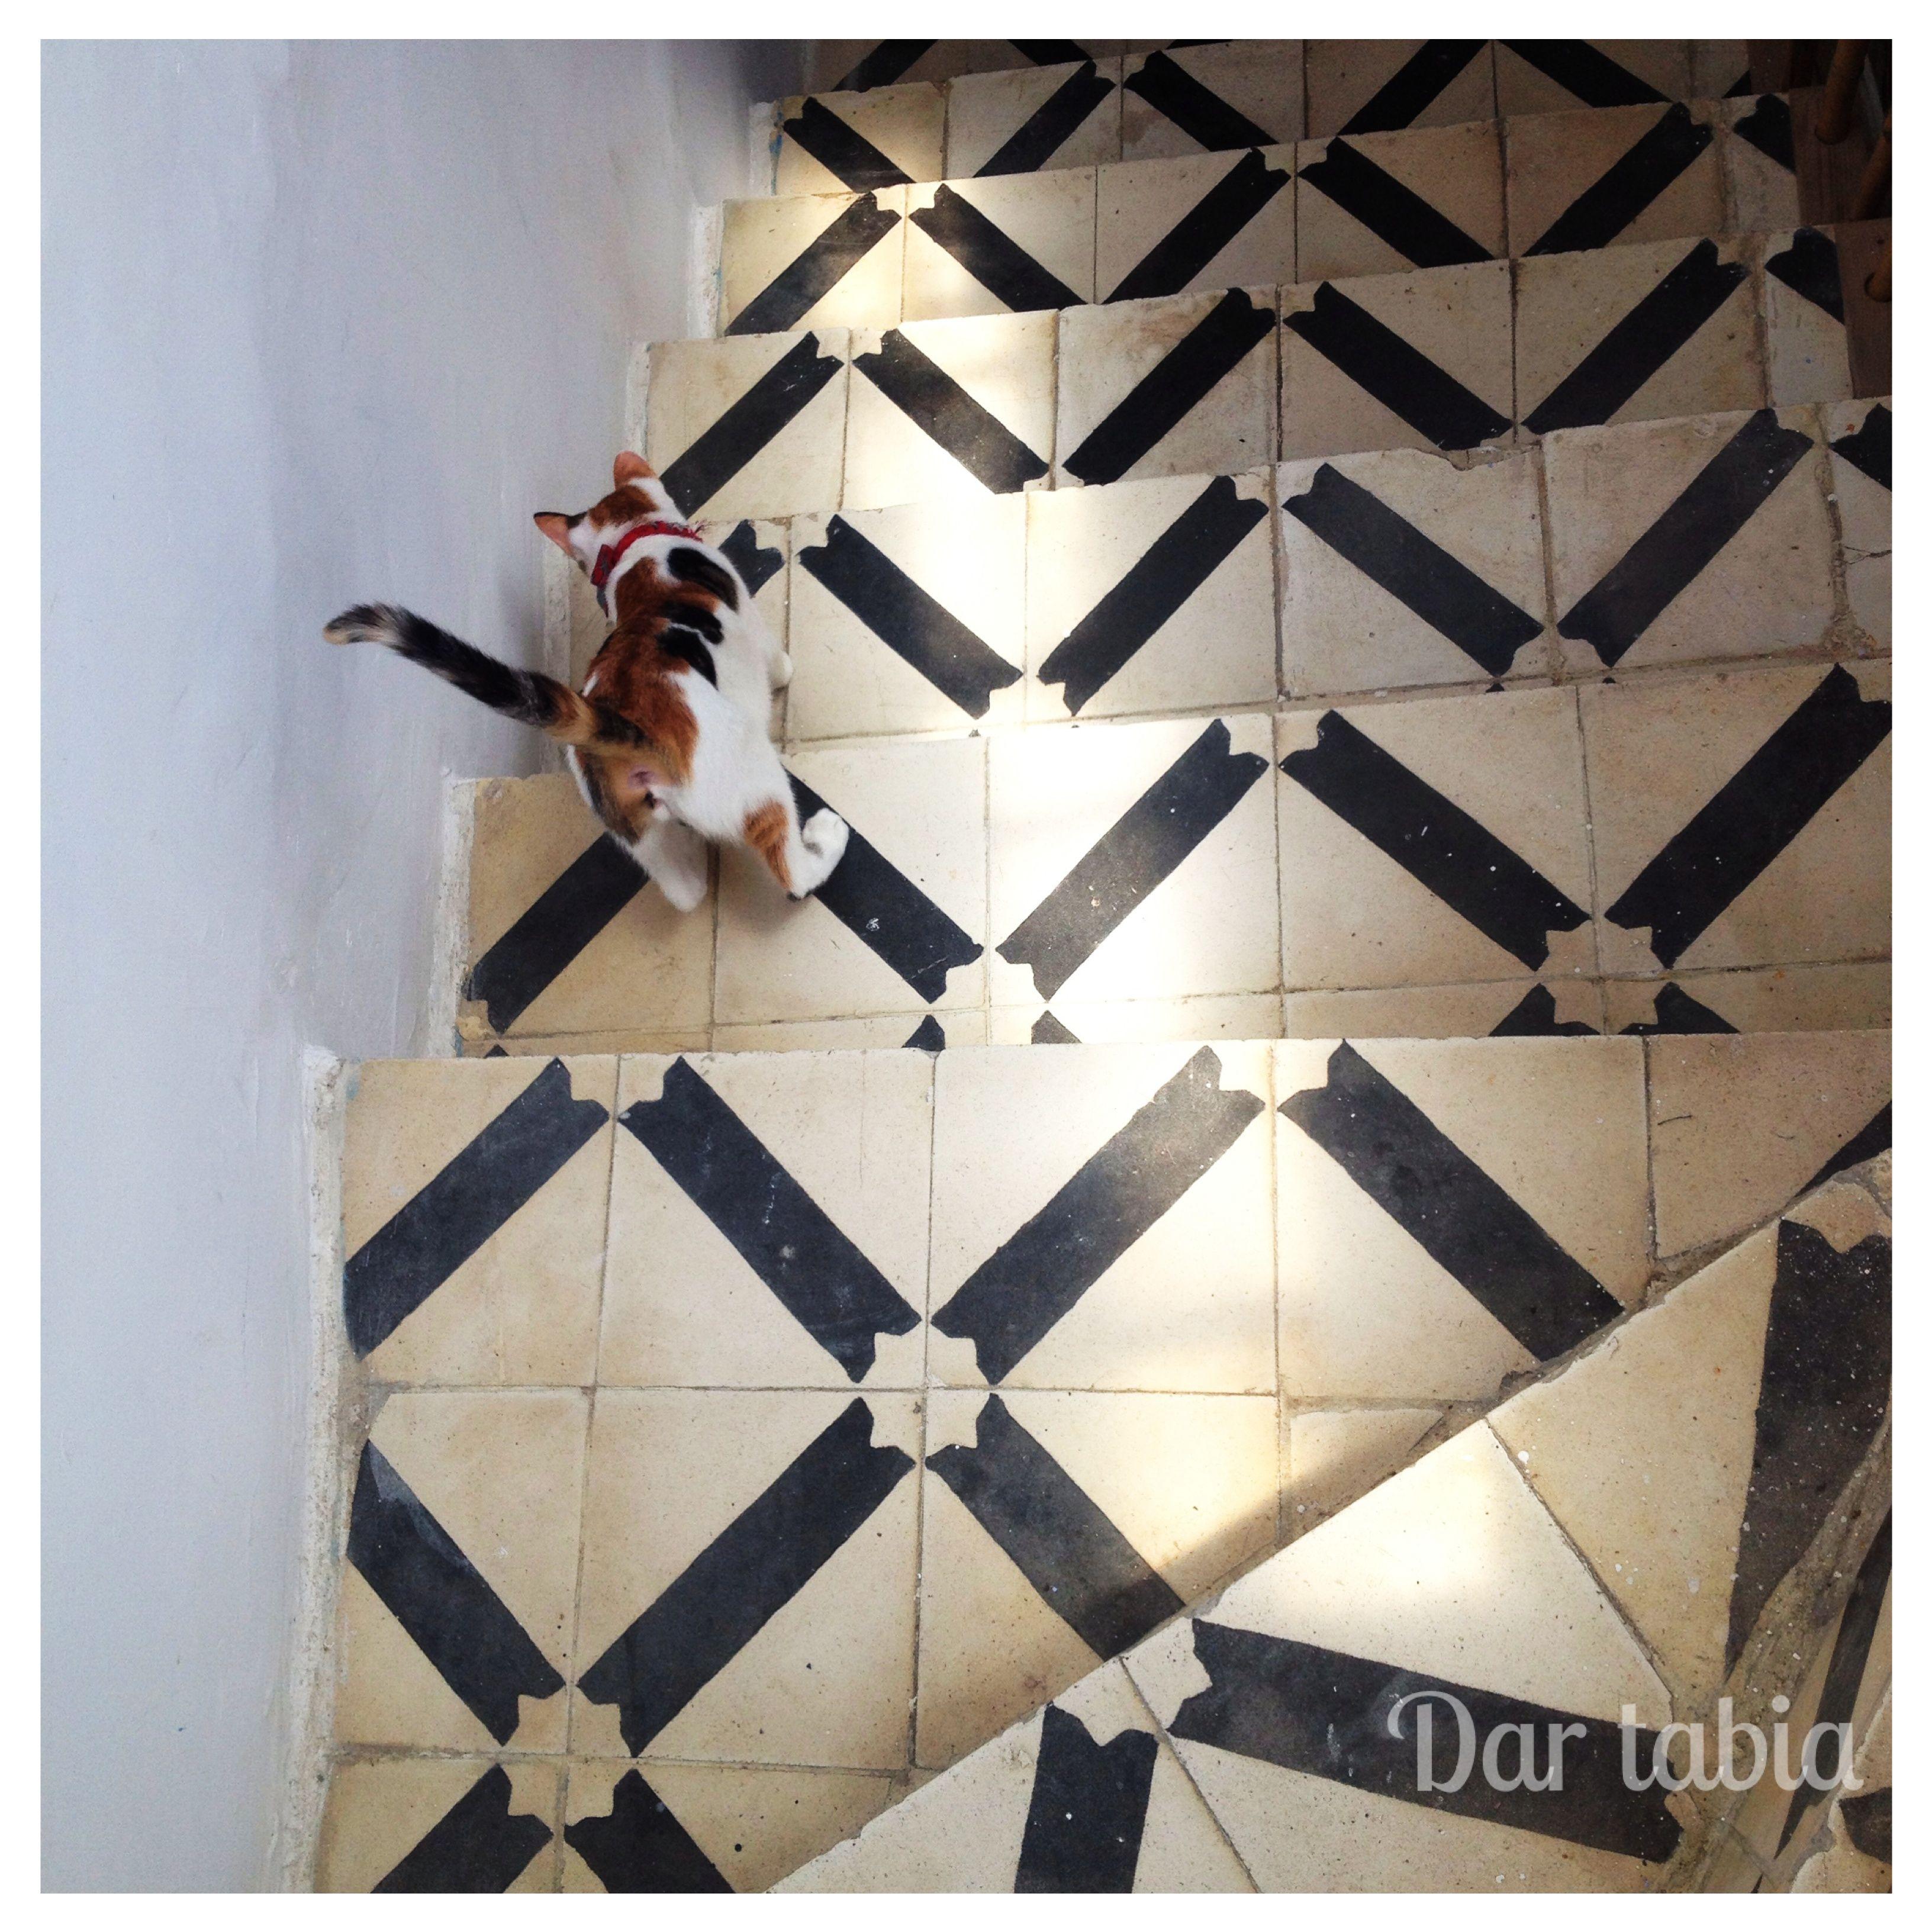 dar tabia maison d'hotes d'Asilah Maroc